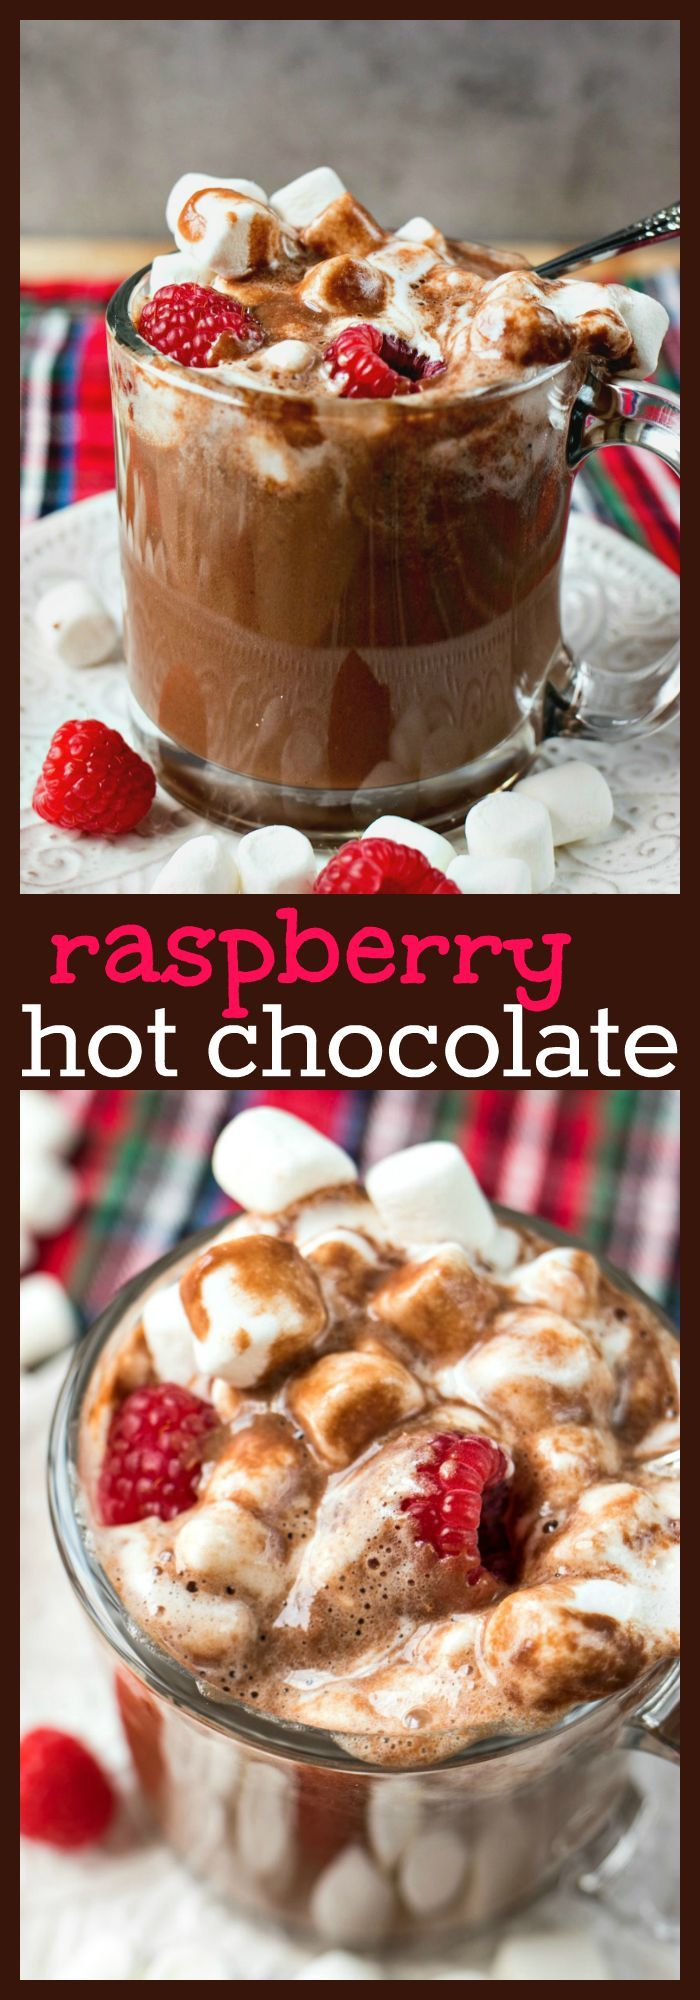 Raspberry Hot Chocolate – Creamy homemade hot chocolate made with a fruity addition – fresh raspberries! #hotchocolate #chocolate #raspberry #dessert #ComfortFood